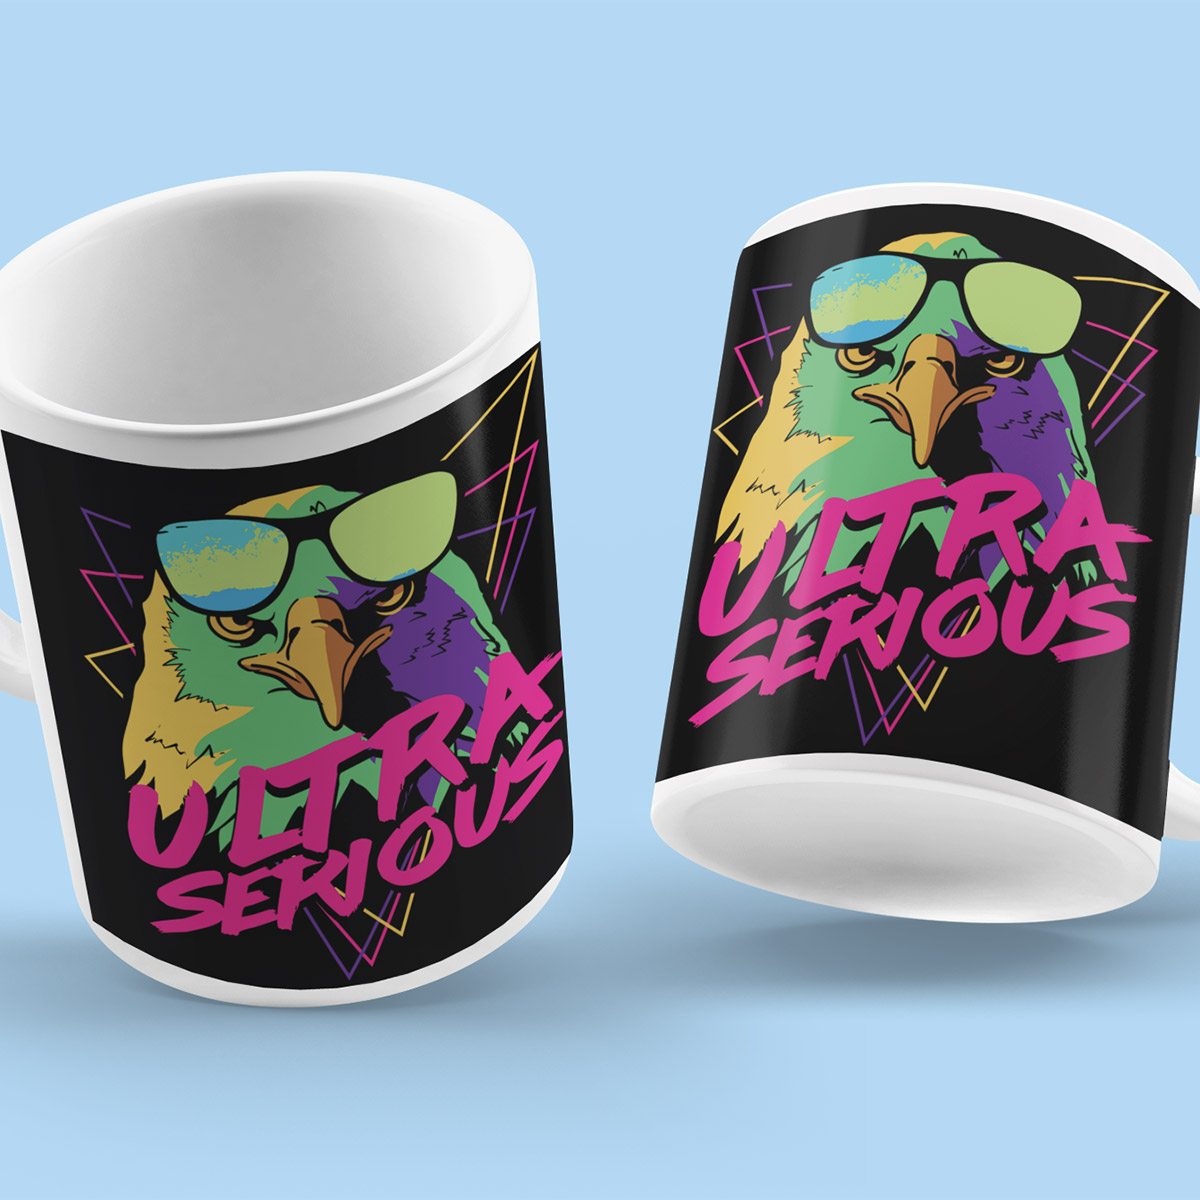 Ultra Serious Poker Mug